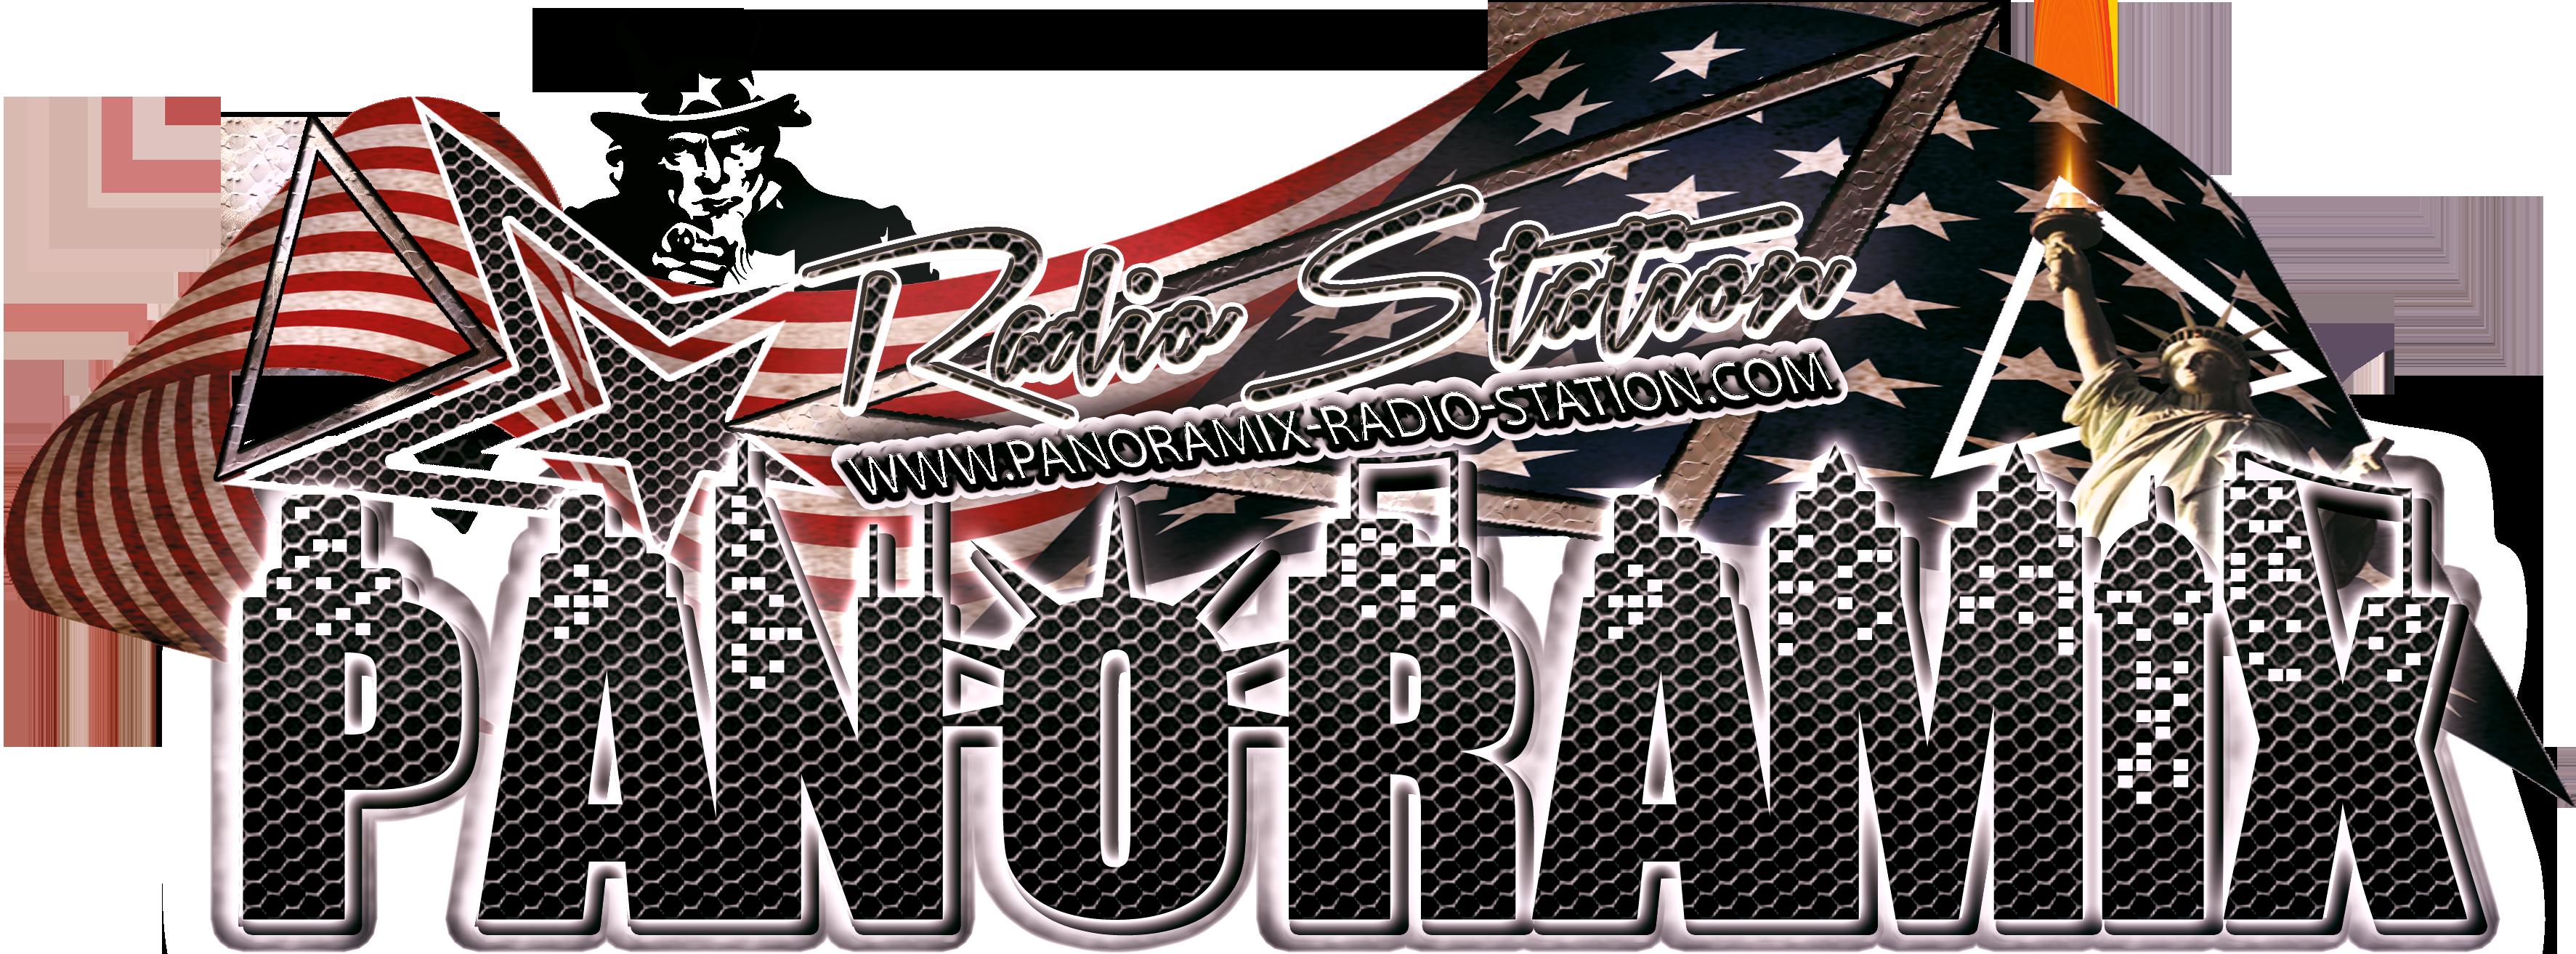 http://panoramix-radio-station.com/wp-content/uploads/2017/01/LOGO-OFFICIEL-2017-DRAPEAU-AMERICAIN-PANORAMIX-.png